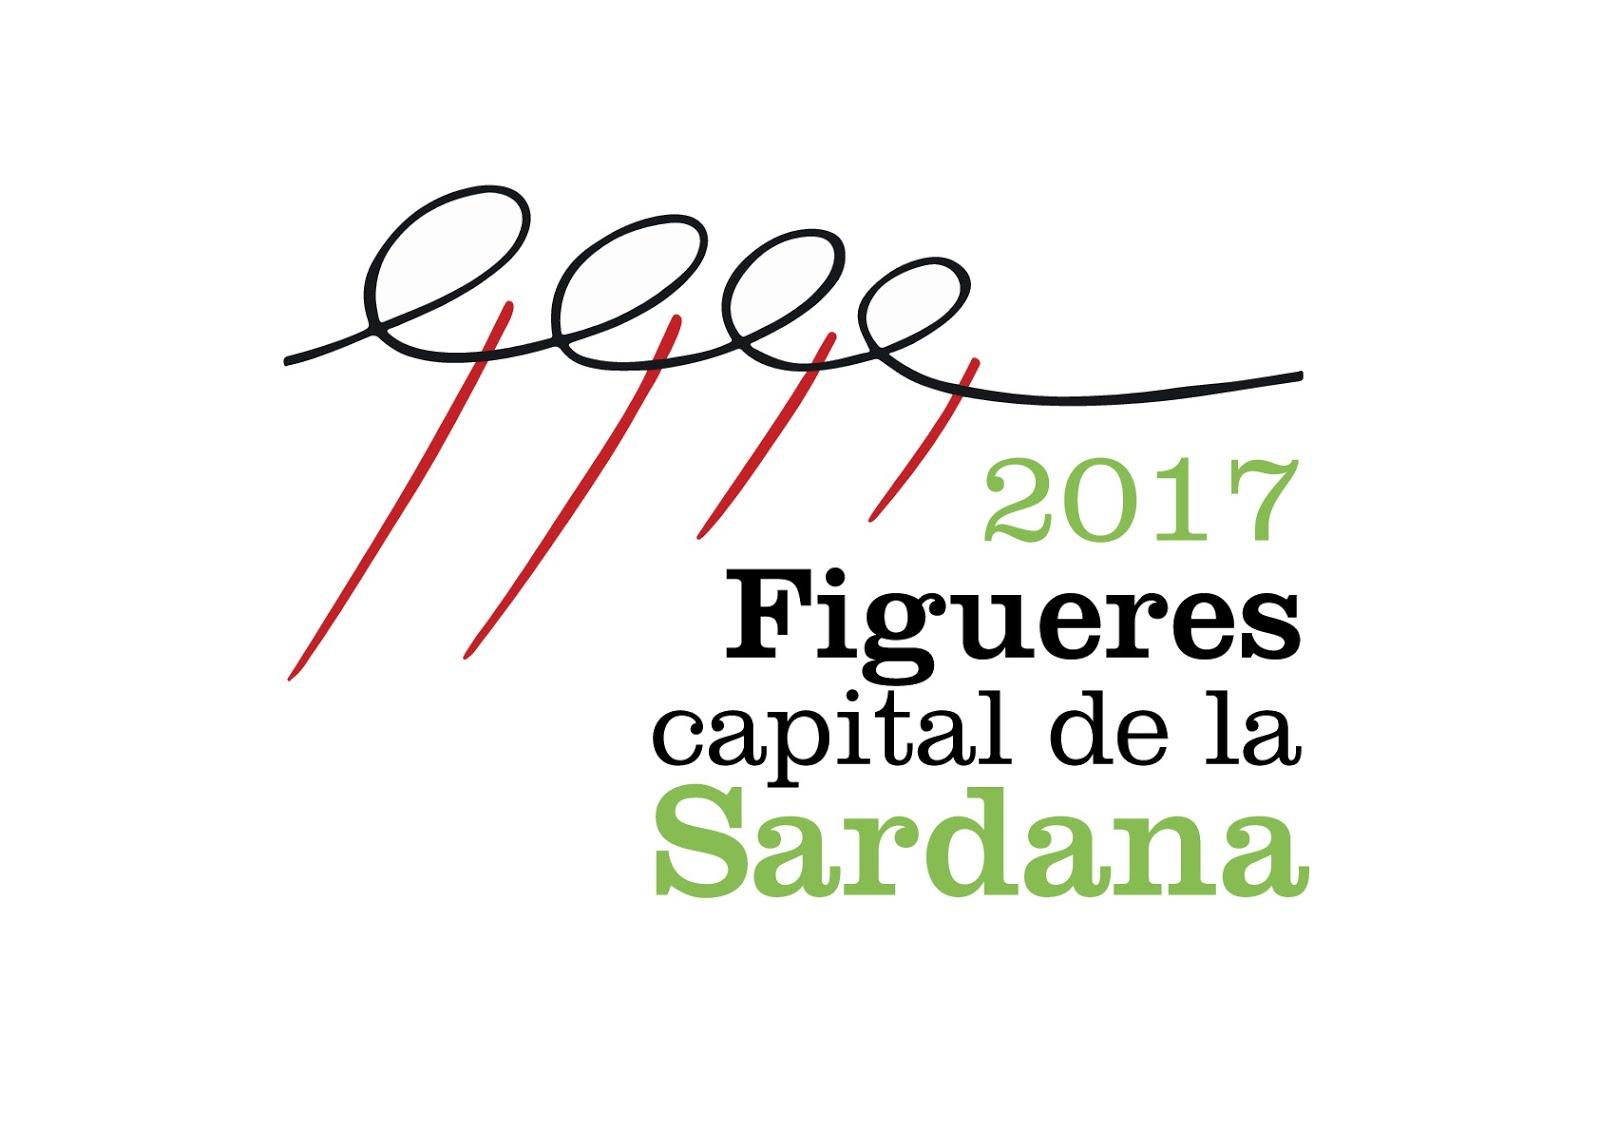 Figueres Capital de la Sardana 2017